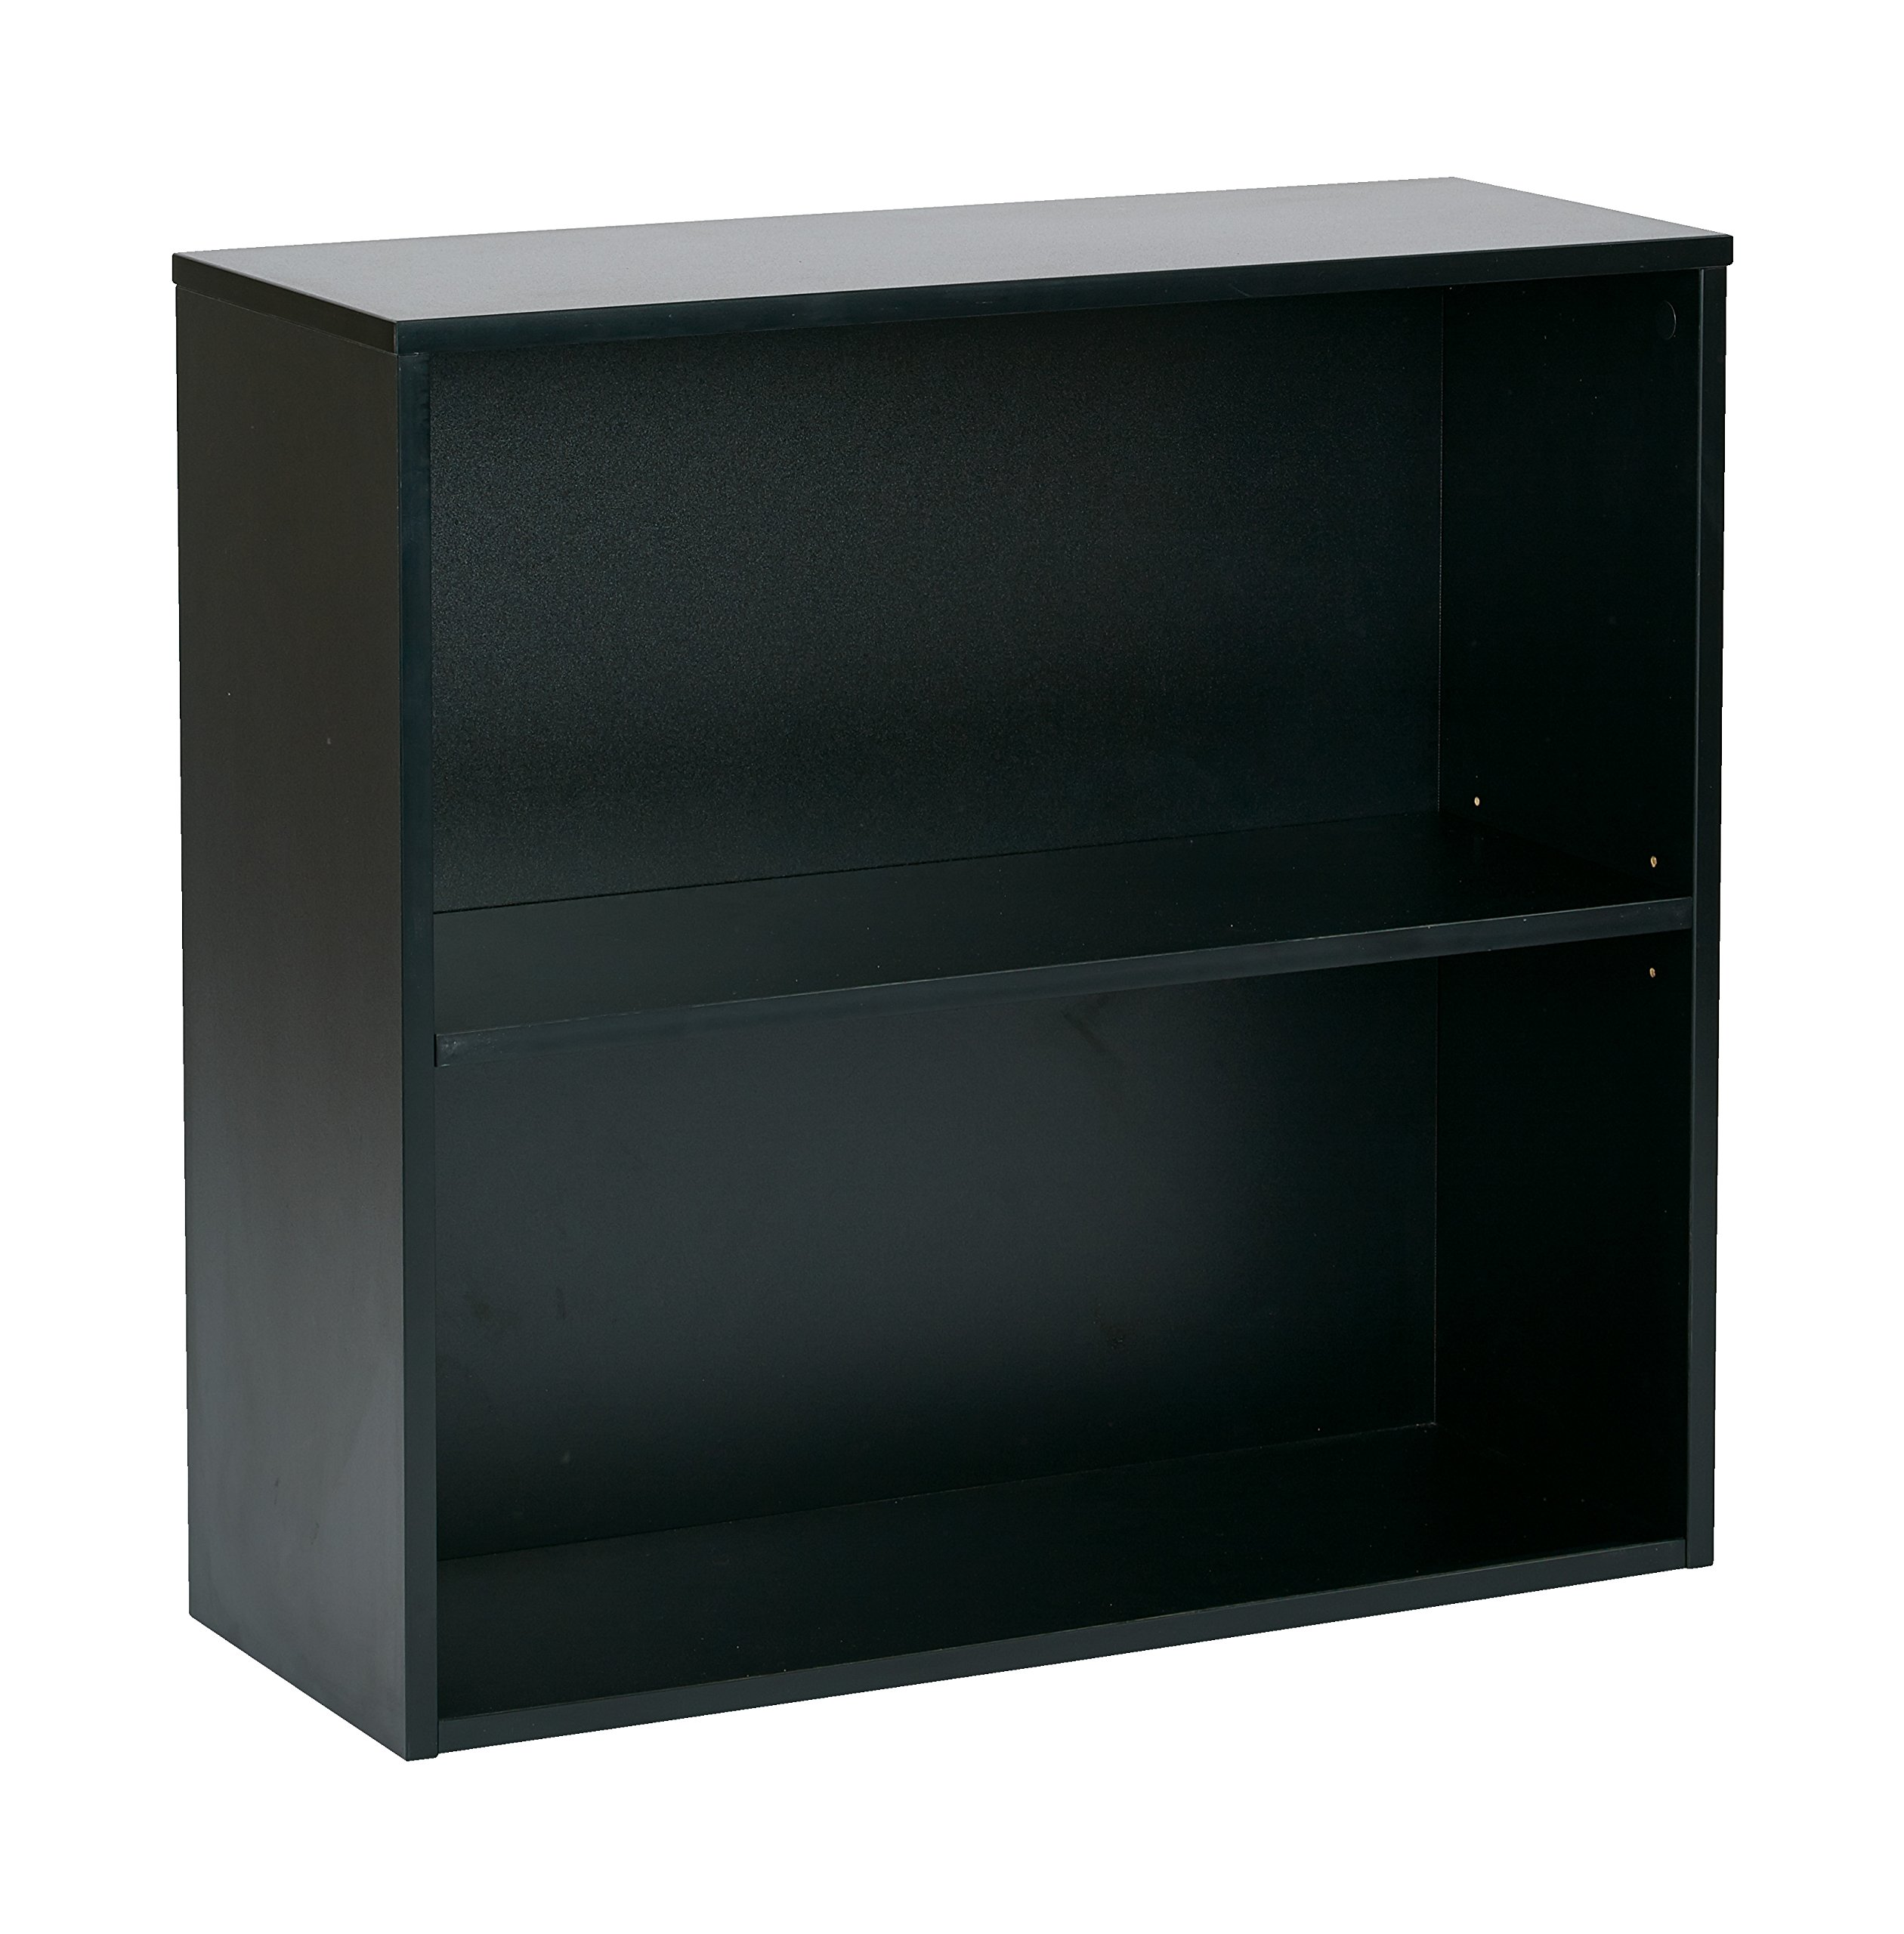 Pro-Line II / OSP Designs Prado 2 Shelf Bookcase, 30-Inch, Black